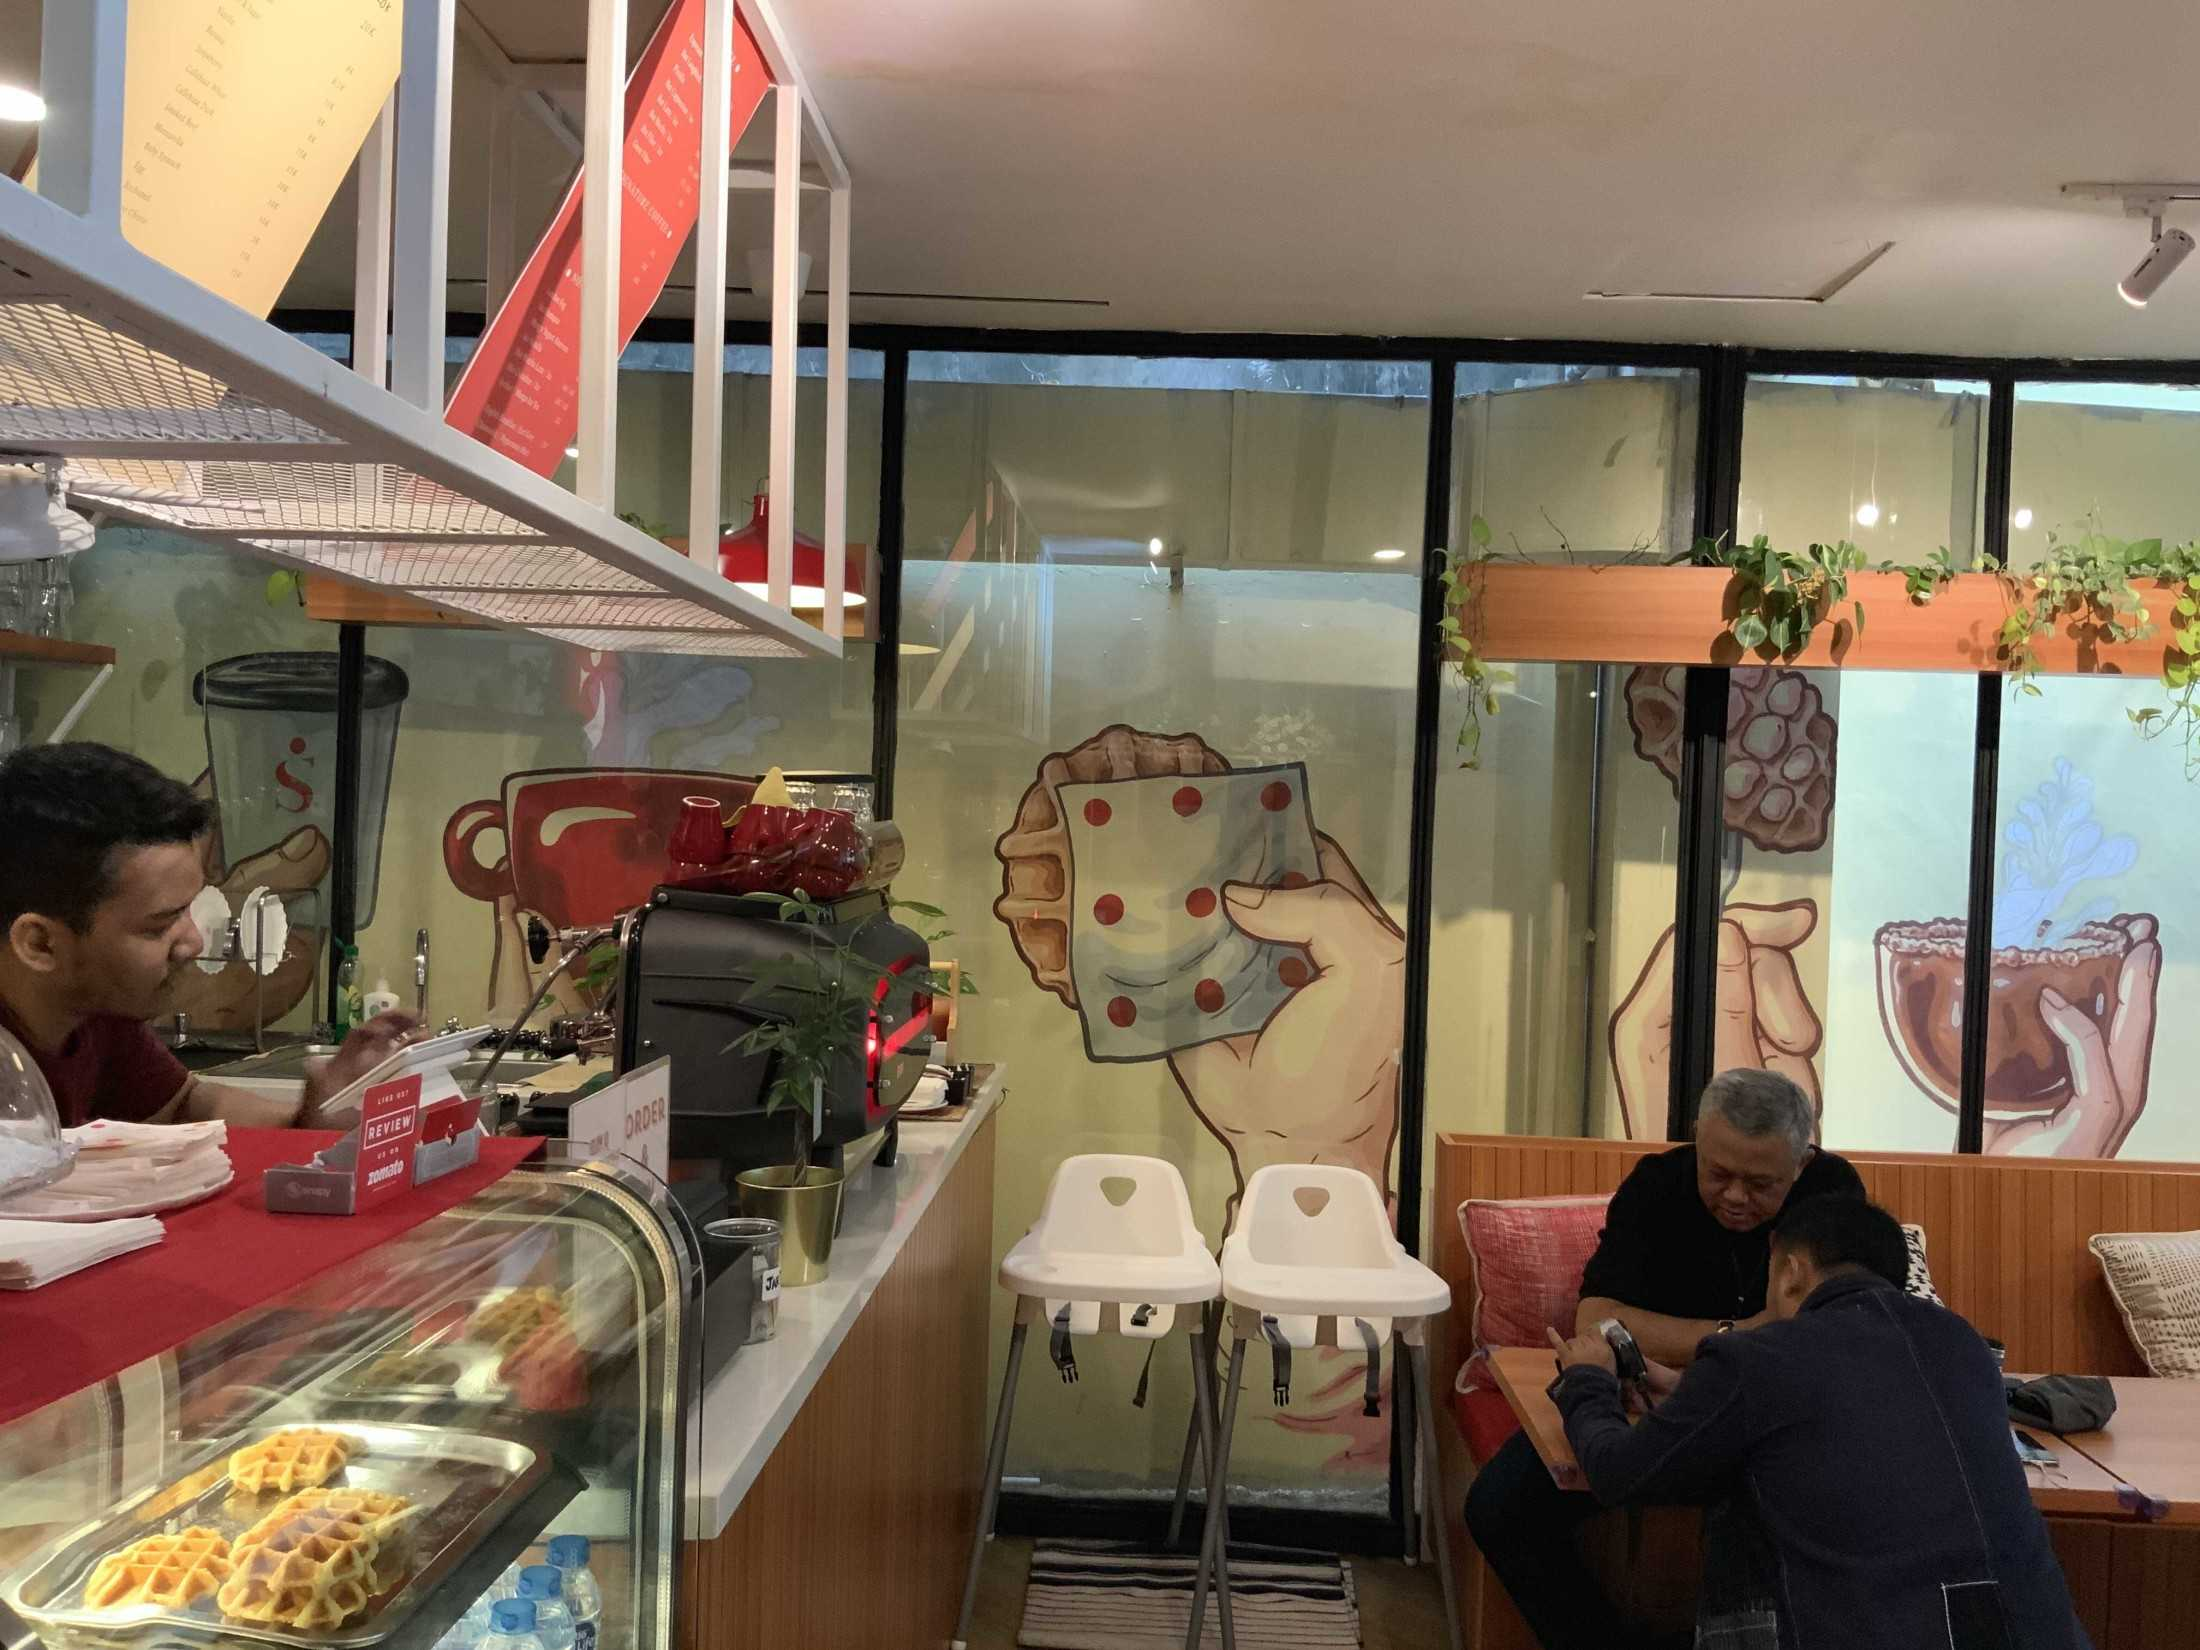 Bito Interior Design N Build Singgah Kitchen & Coffee Jl. Pakubuwono Vi No.2, Rt.1/rw.4, Gunung, Kec. Kby. Baru, Kota Jakarta Selatan, Daerah Khusus Ibukota Jakarta 12120, Indonesia Jl. Pakubuwono Vi No.2, Rt.1/rw.4, Gunung, Kec. Kby. Baru, Kota Jakarta Selatan, Daerah Khusus Ibukota Jakarta 12120, Indonesia Bito-Interior-Design-N-Build-Singgah-Kitchen-Coffee  90041